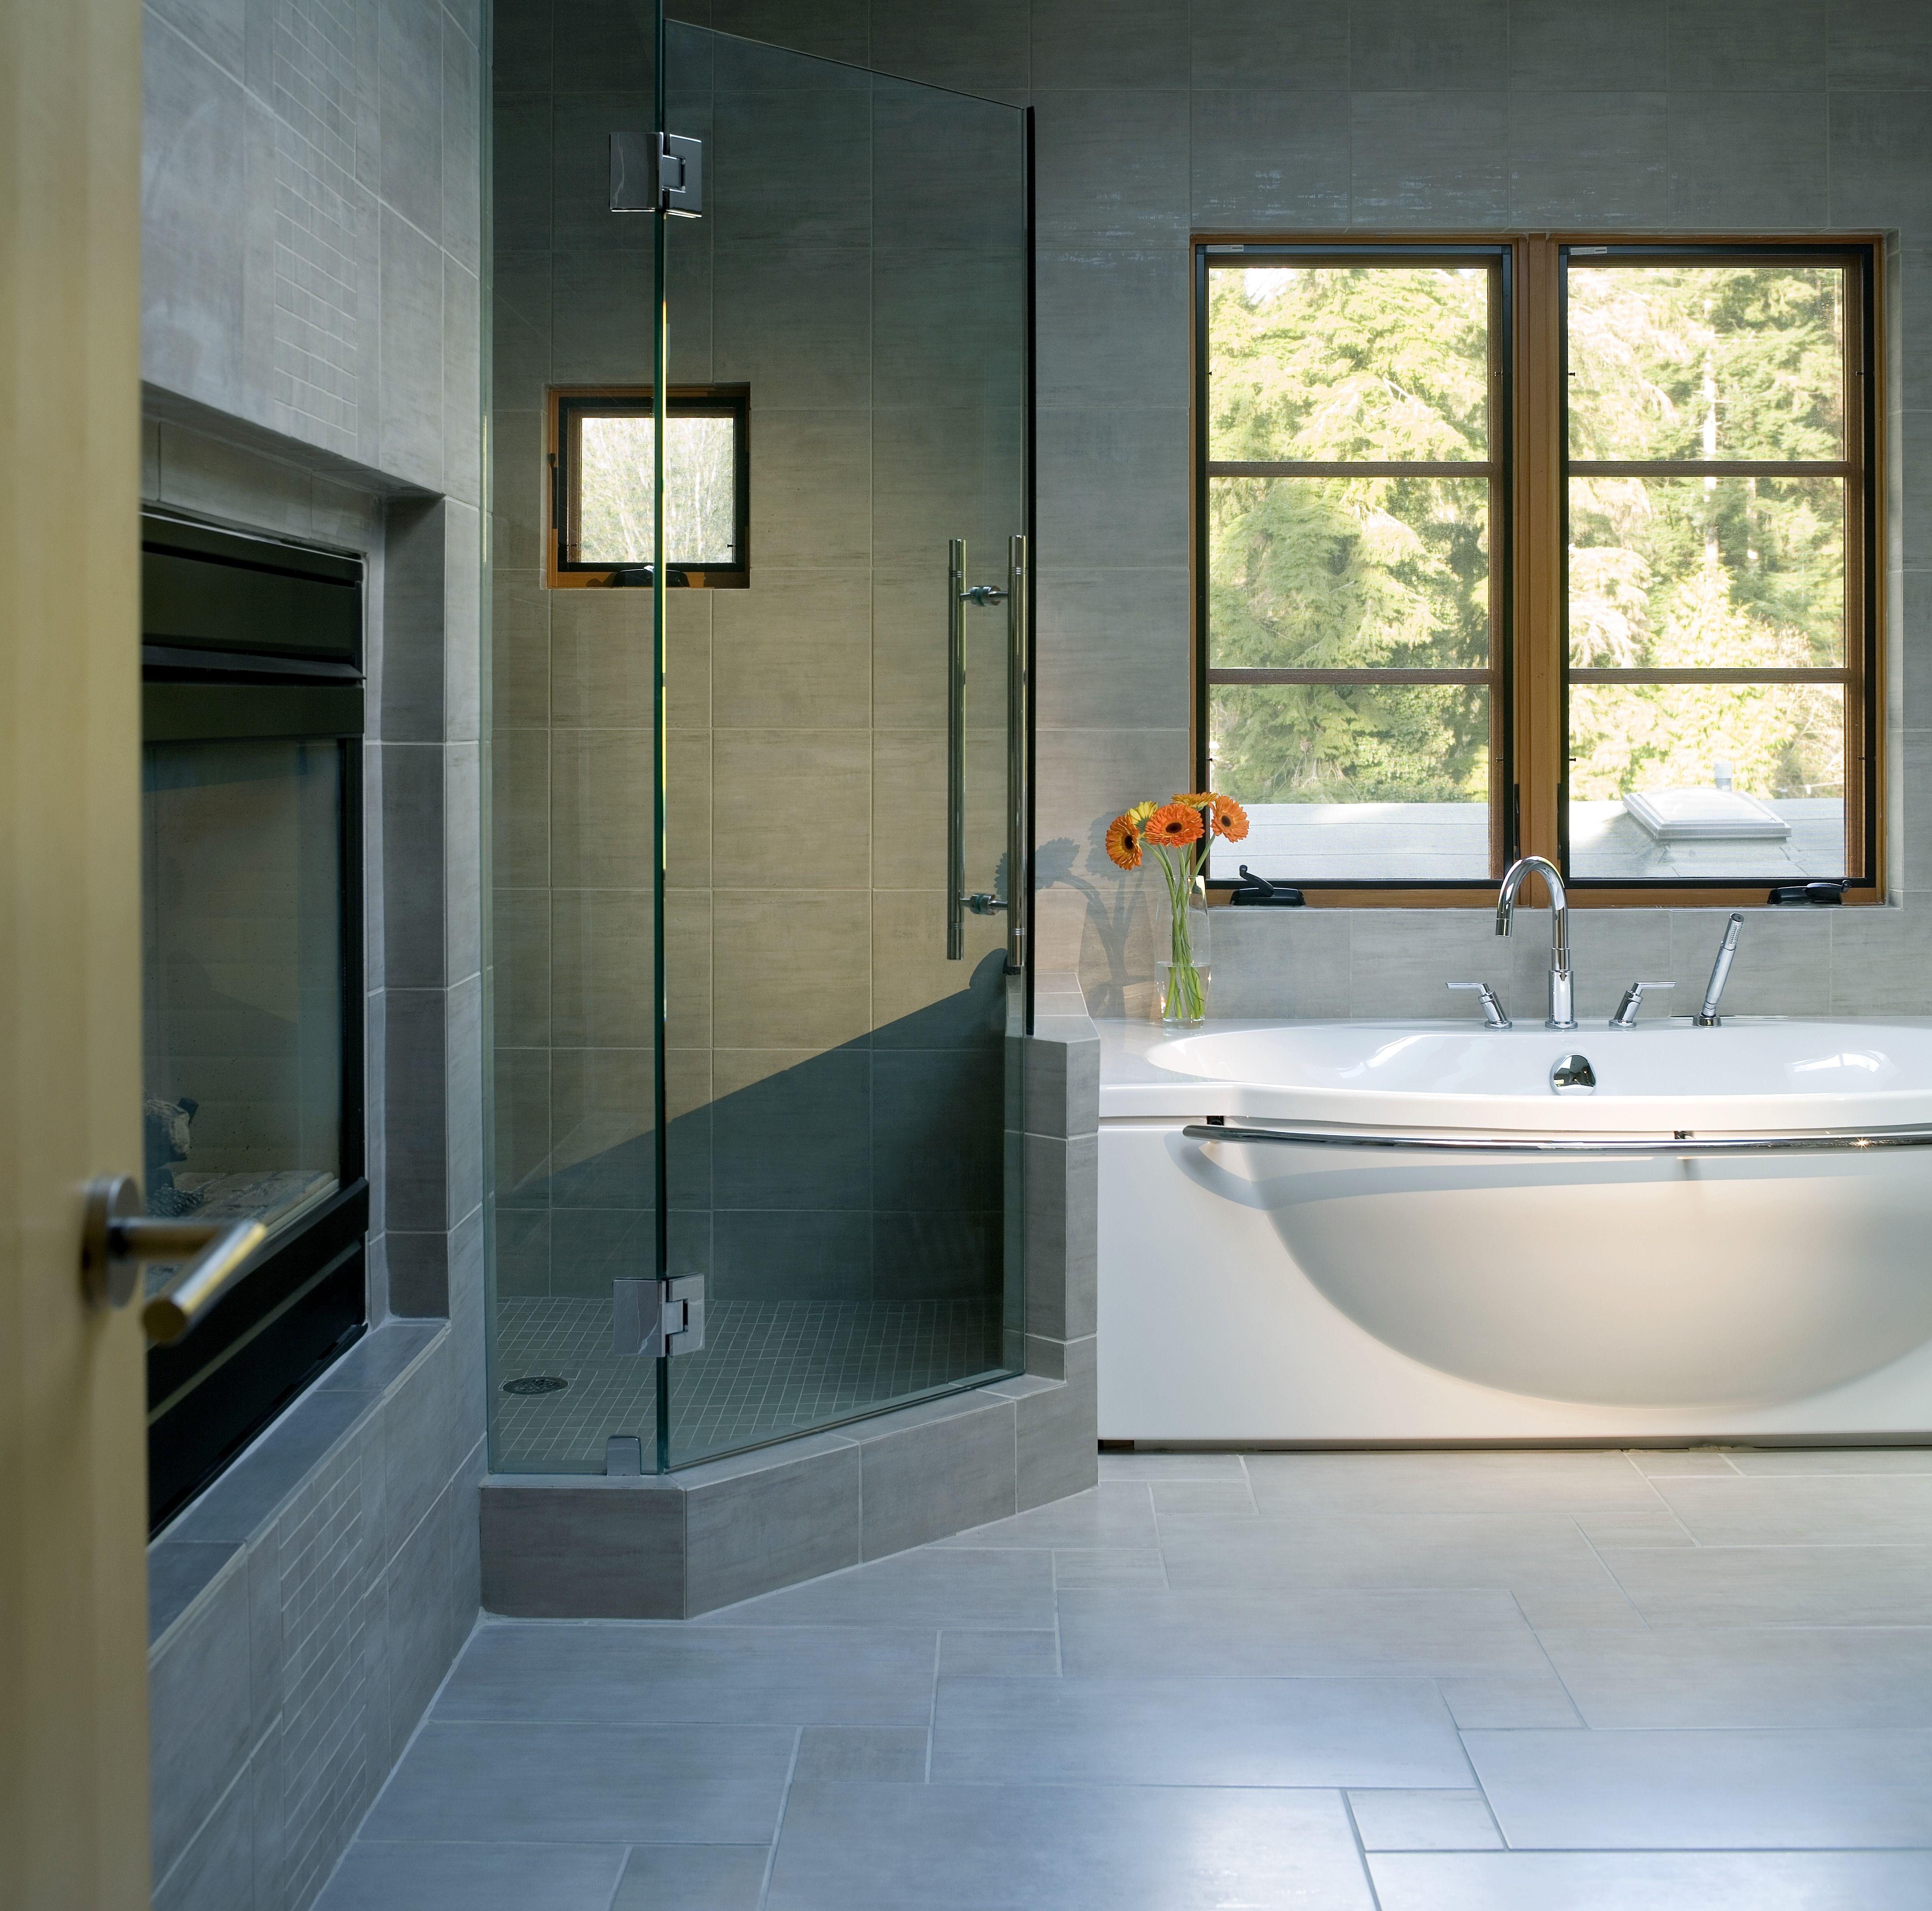 Modern Bathroom With A Corner Shower Enclosed By Gl